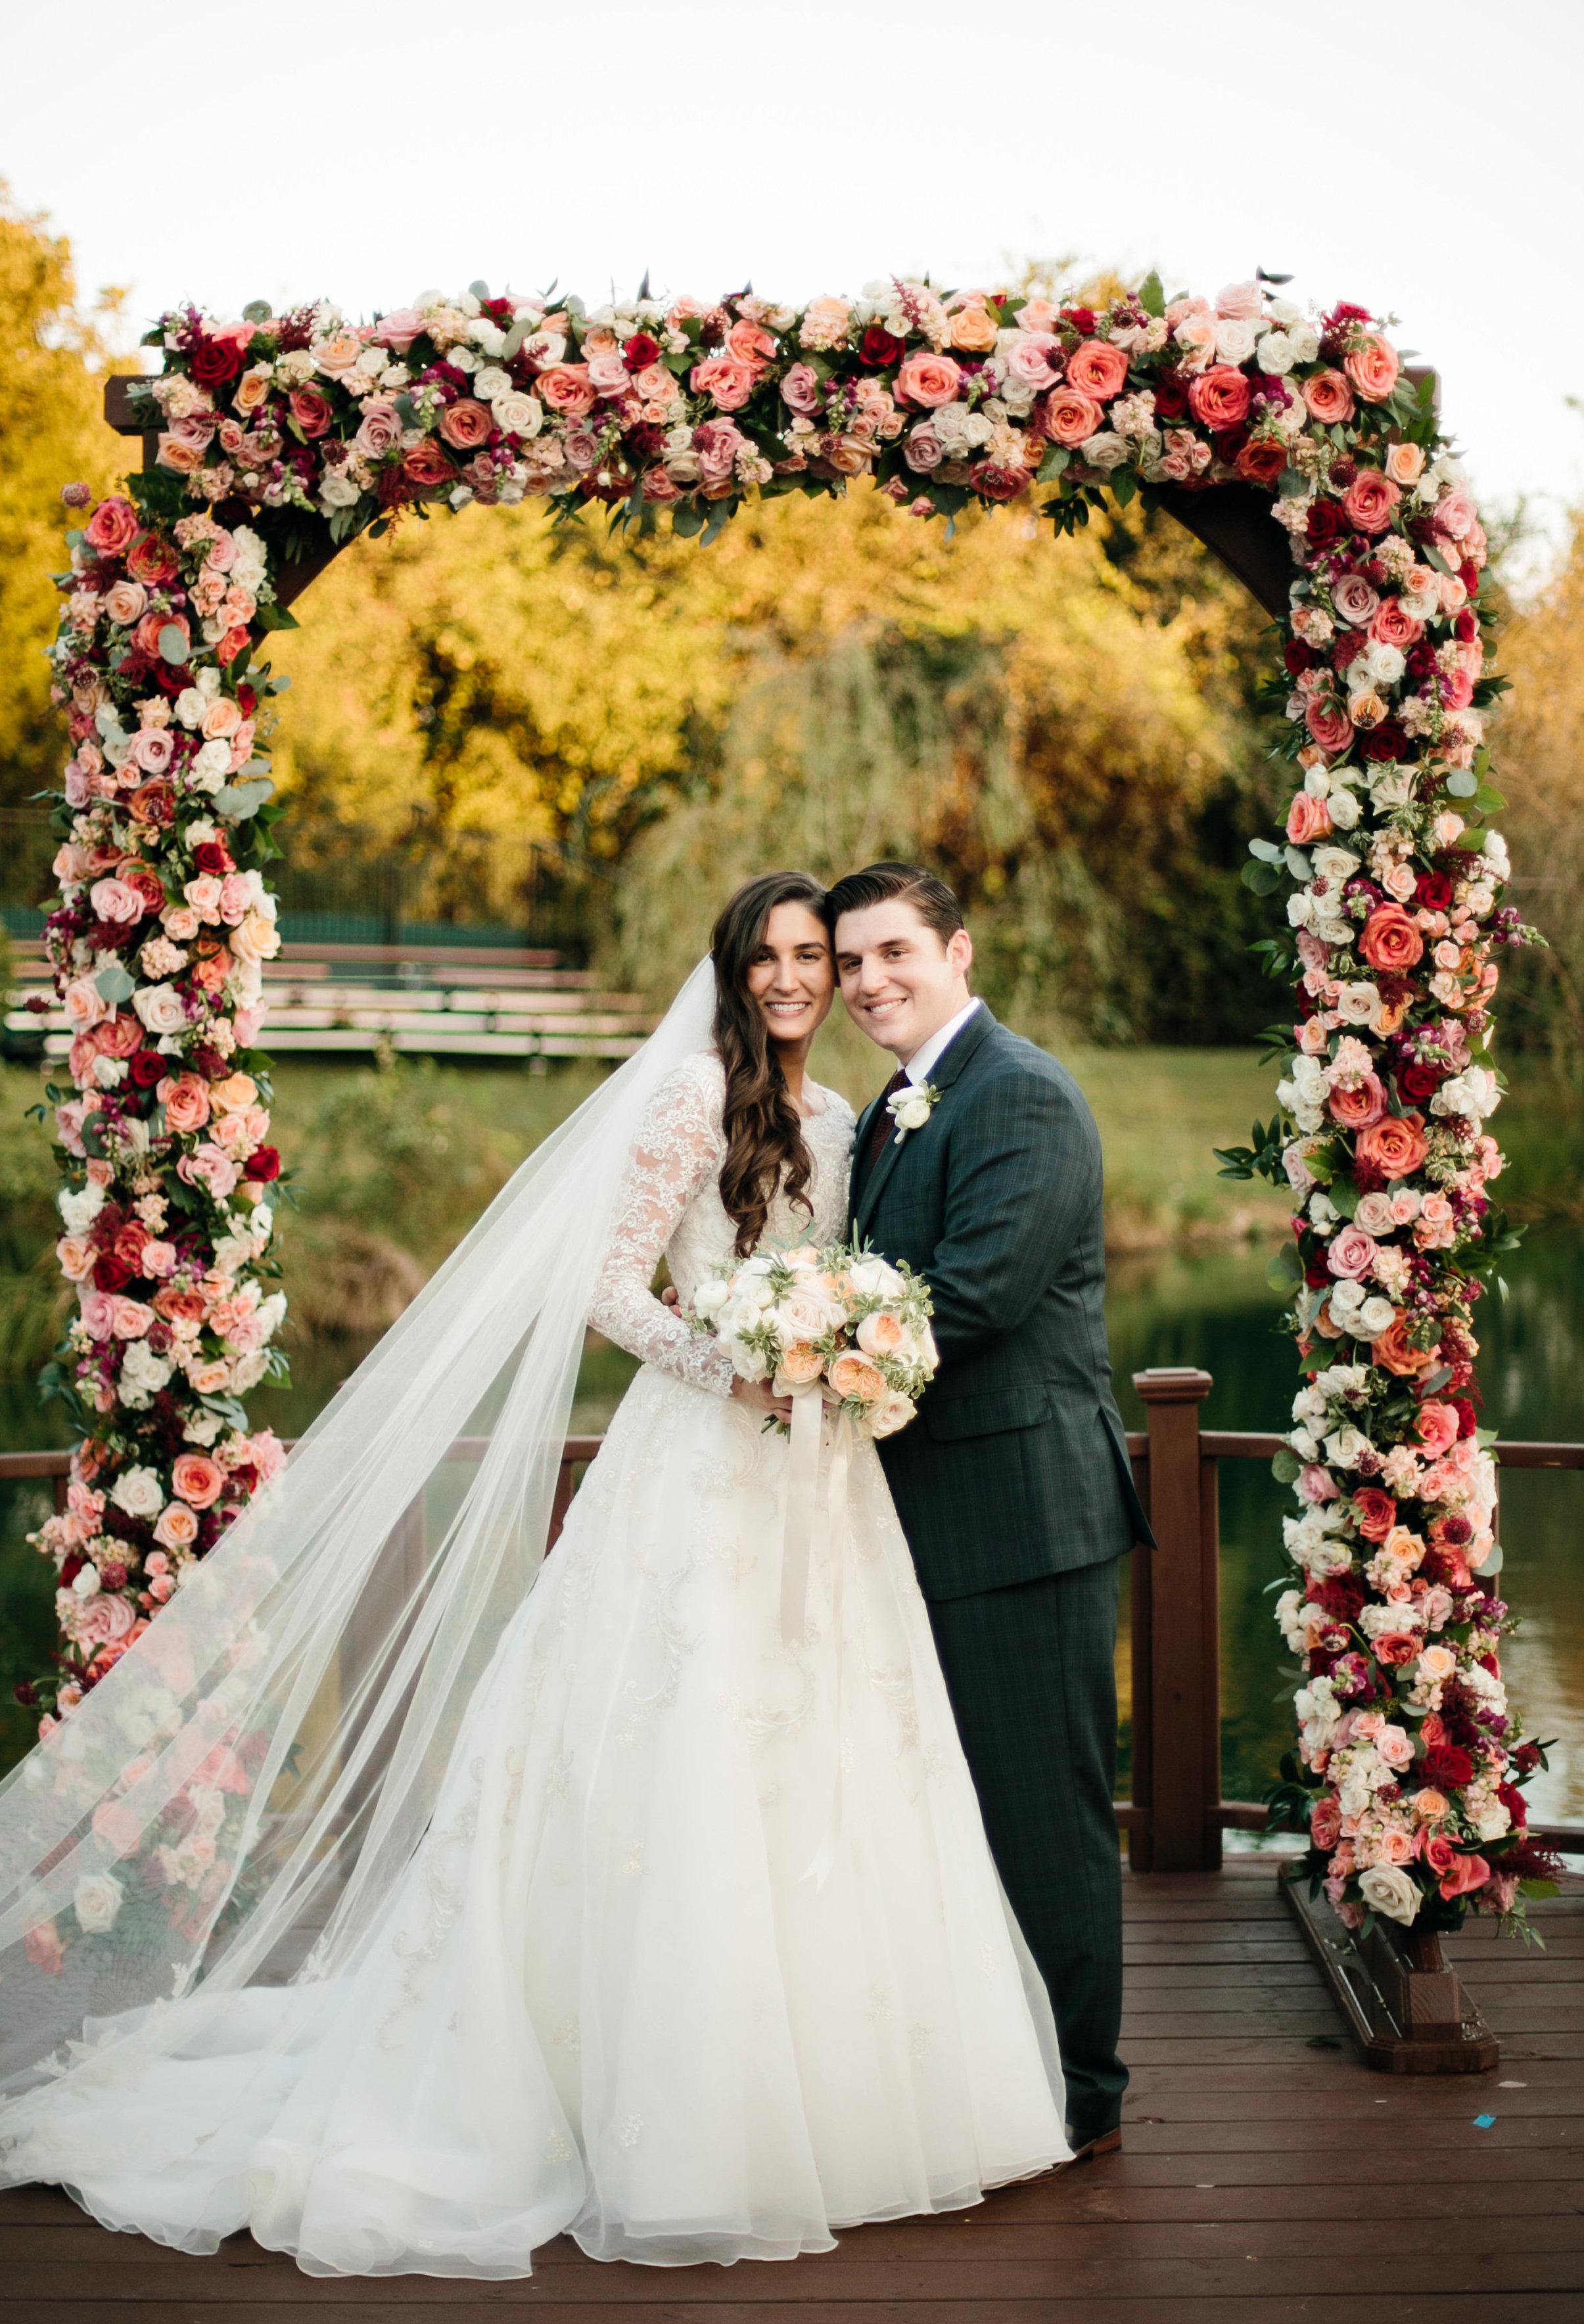 shannon_rose_rent_my_dust_fall_wedding_ (2).jpg